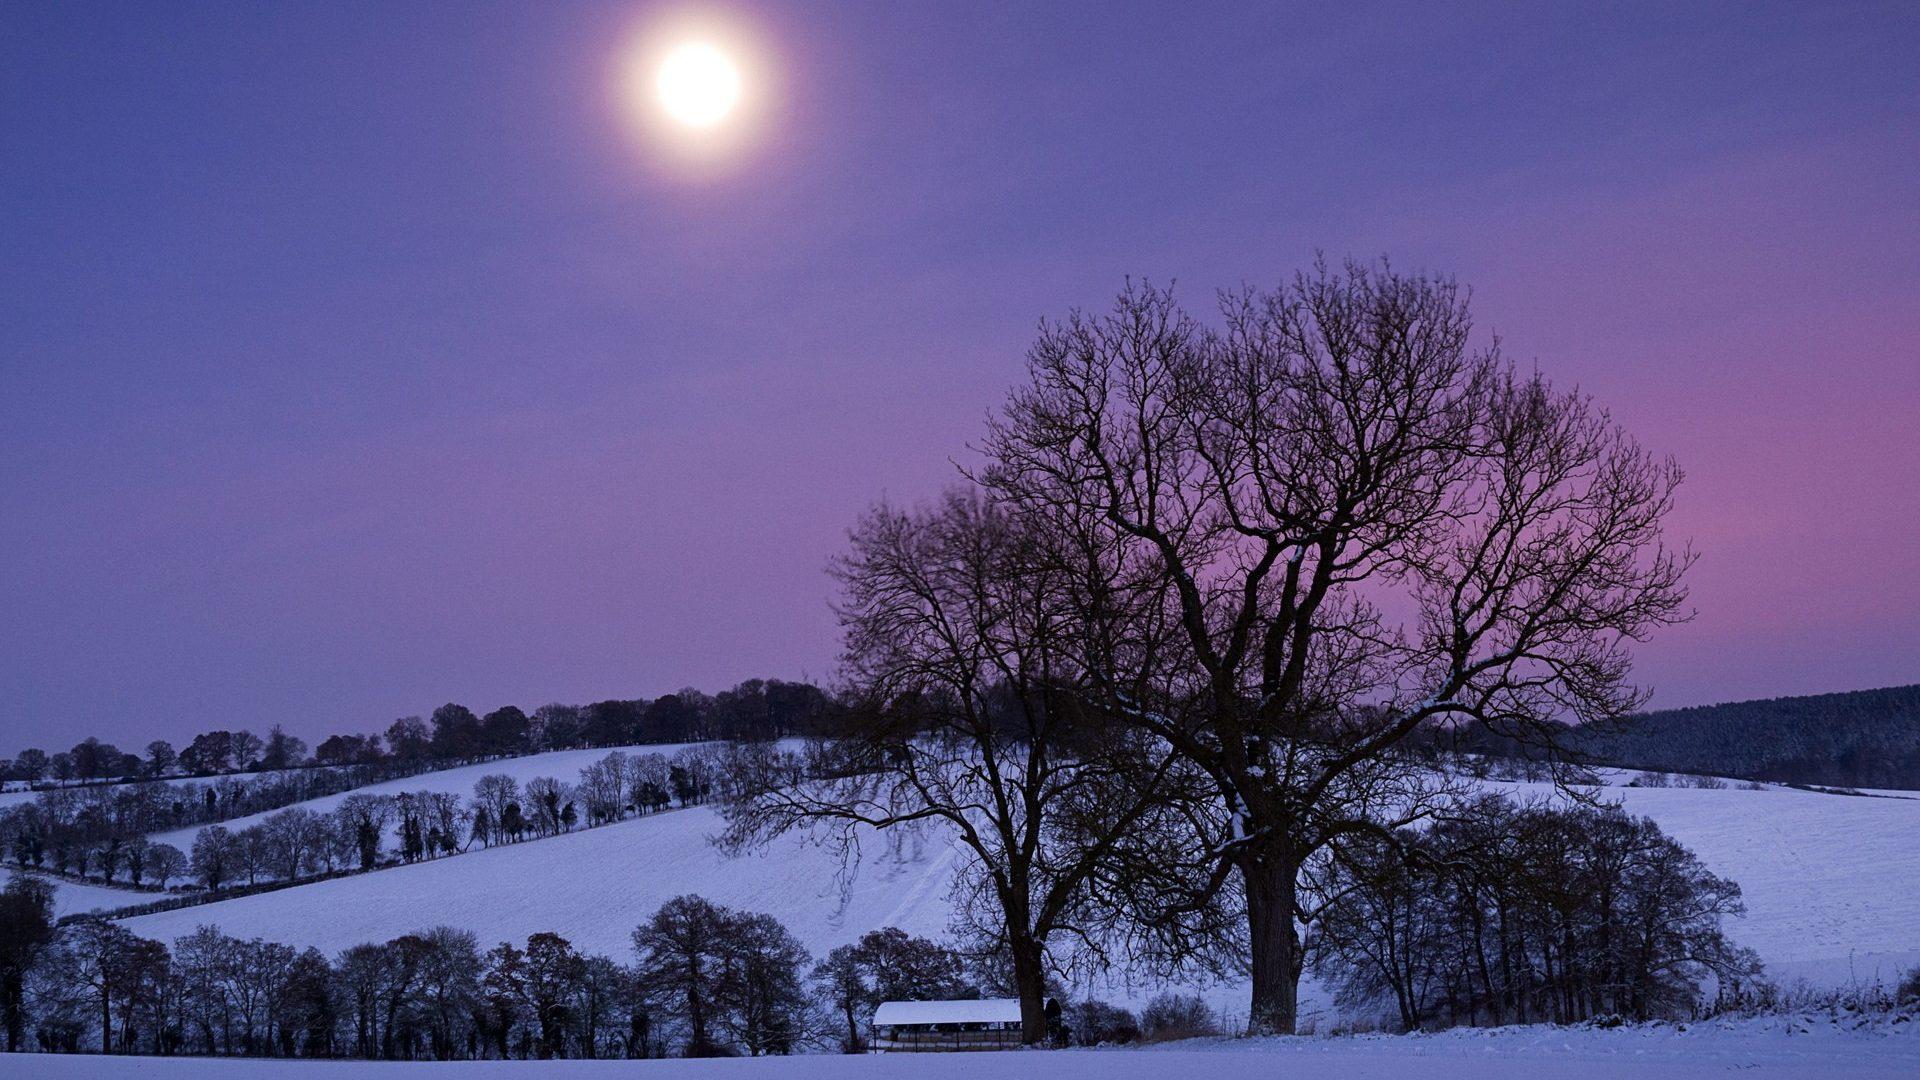 Image -moonlight in winter